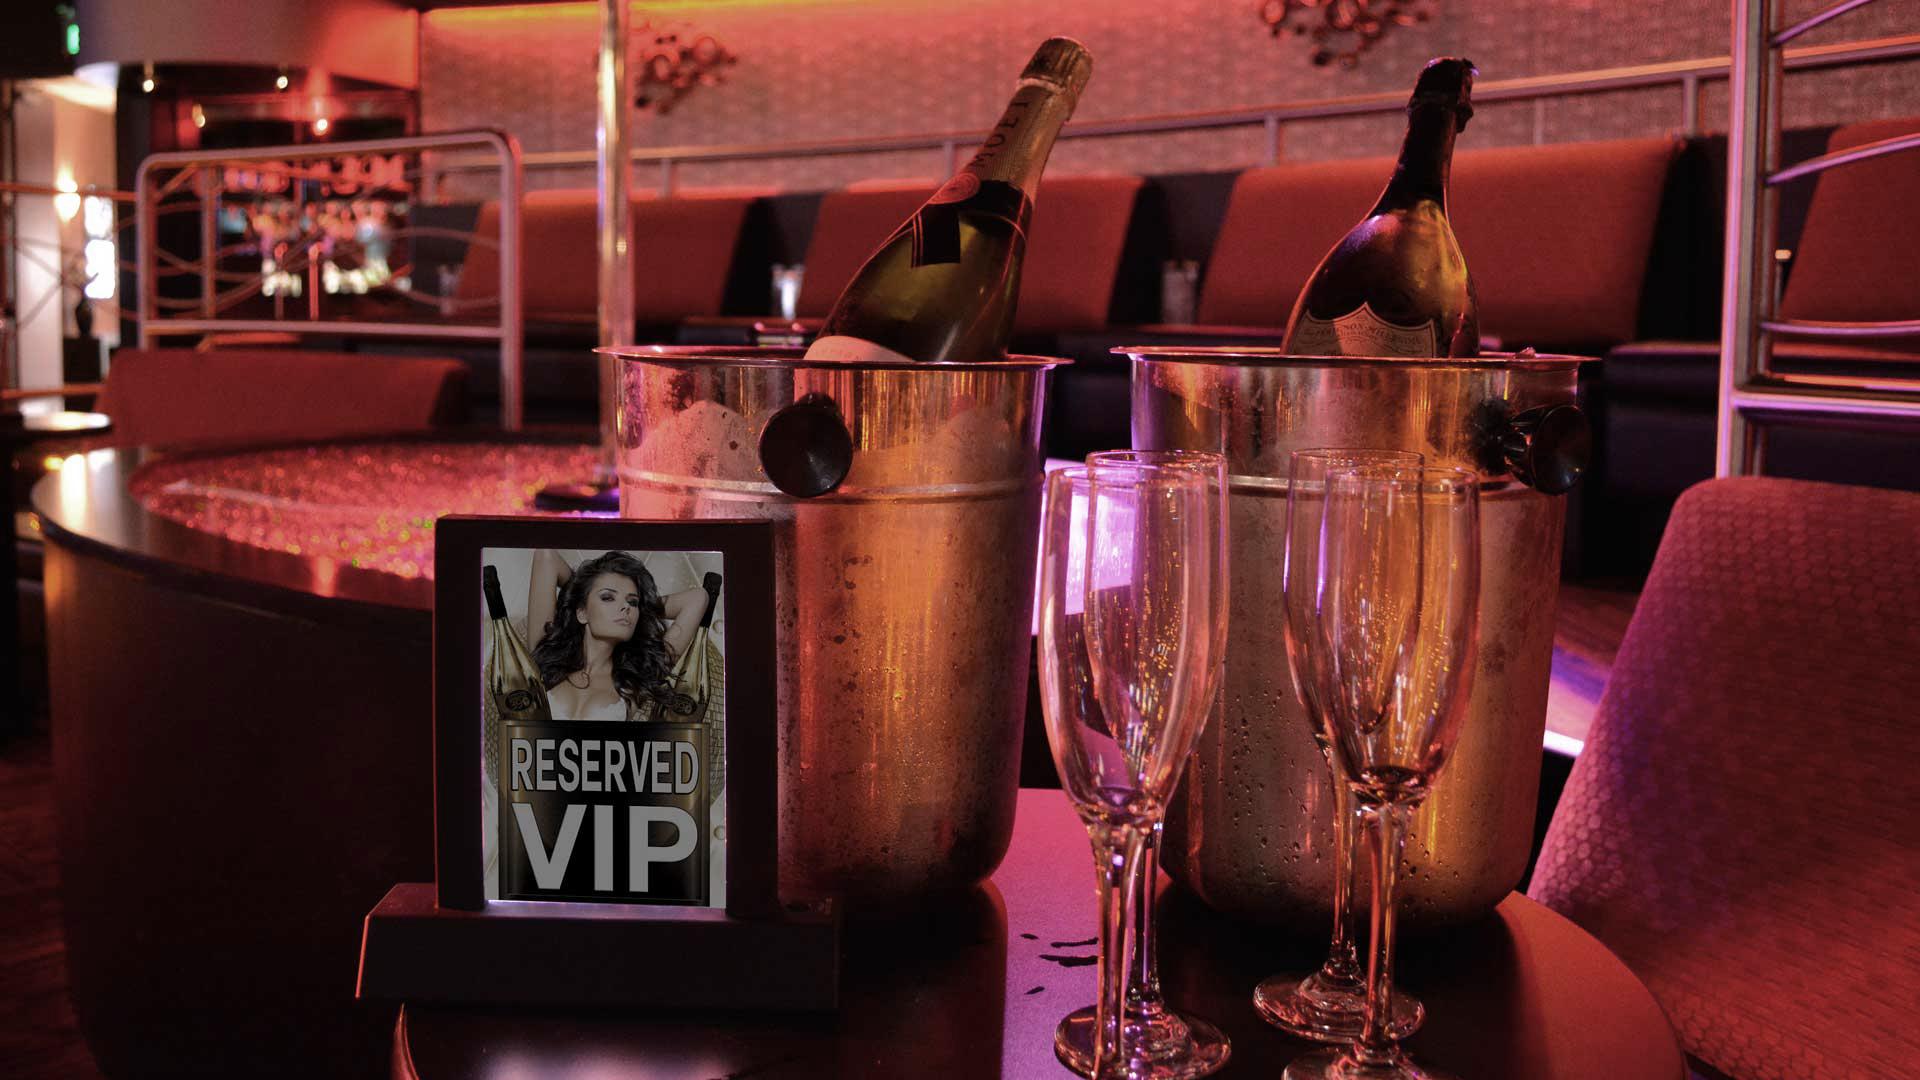 Strip Club VIP Memberships